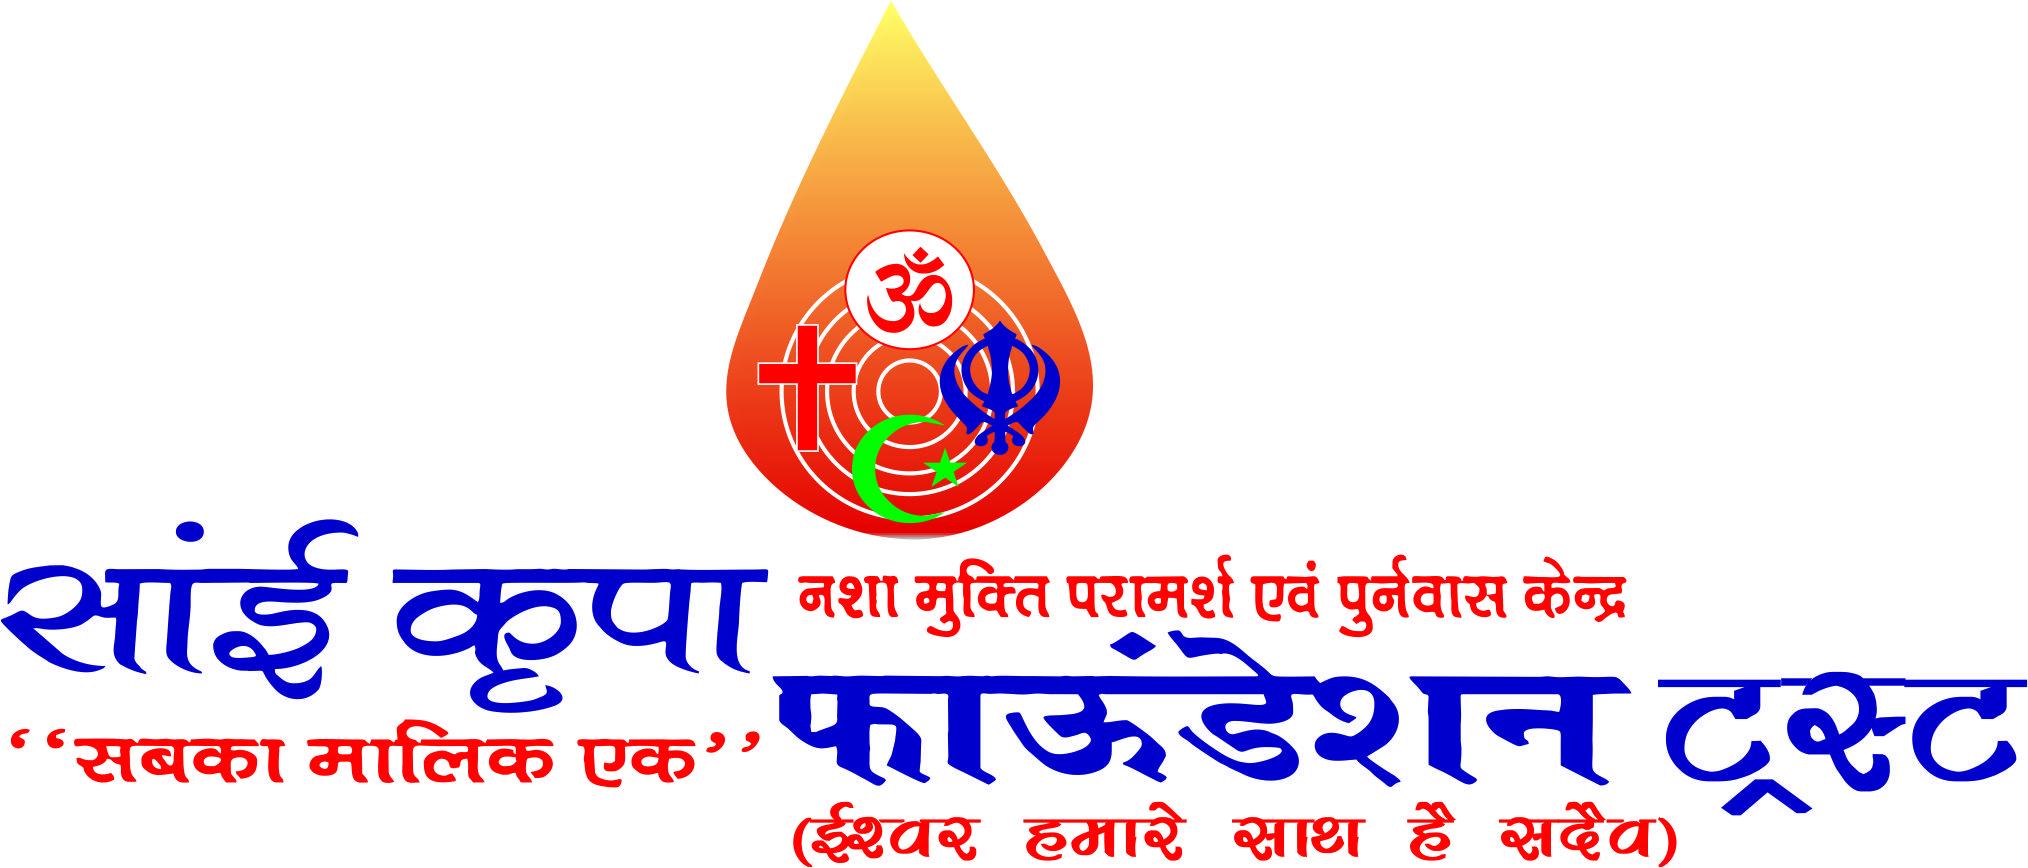 Haldwani De-Addiction Centres | Drug & Alcohol Rehabilitation | Nasha Mukti Kender